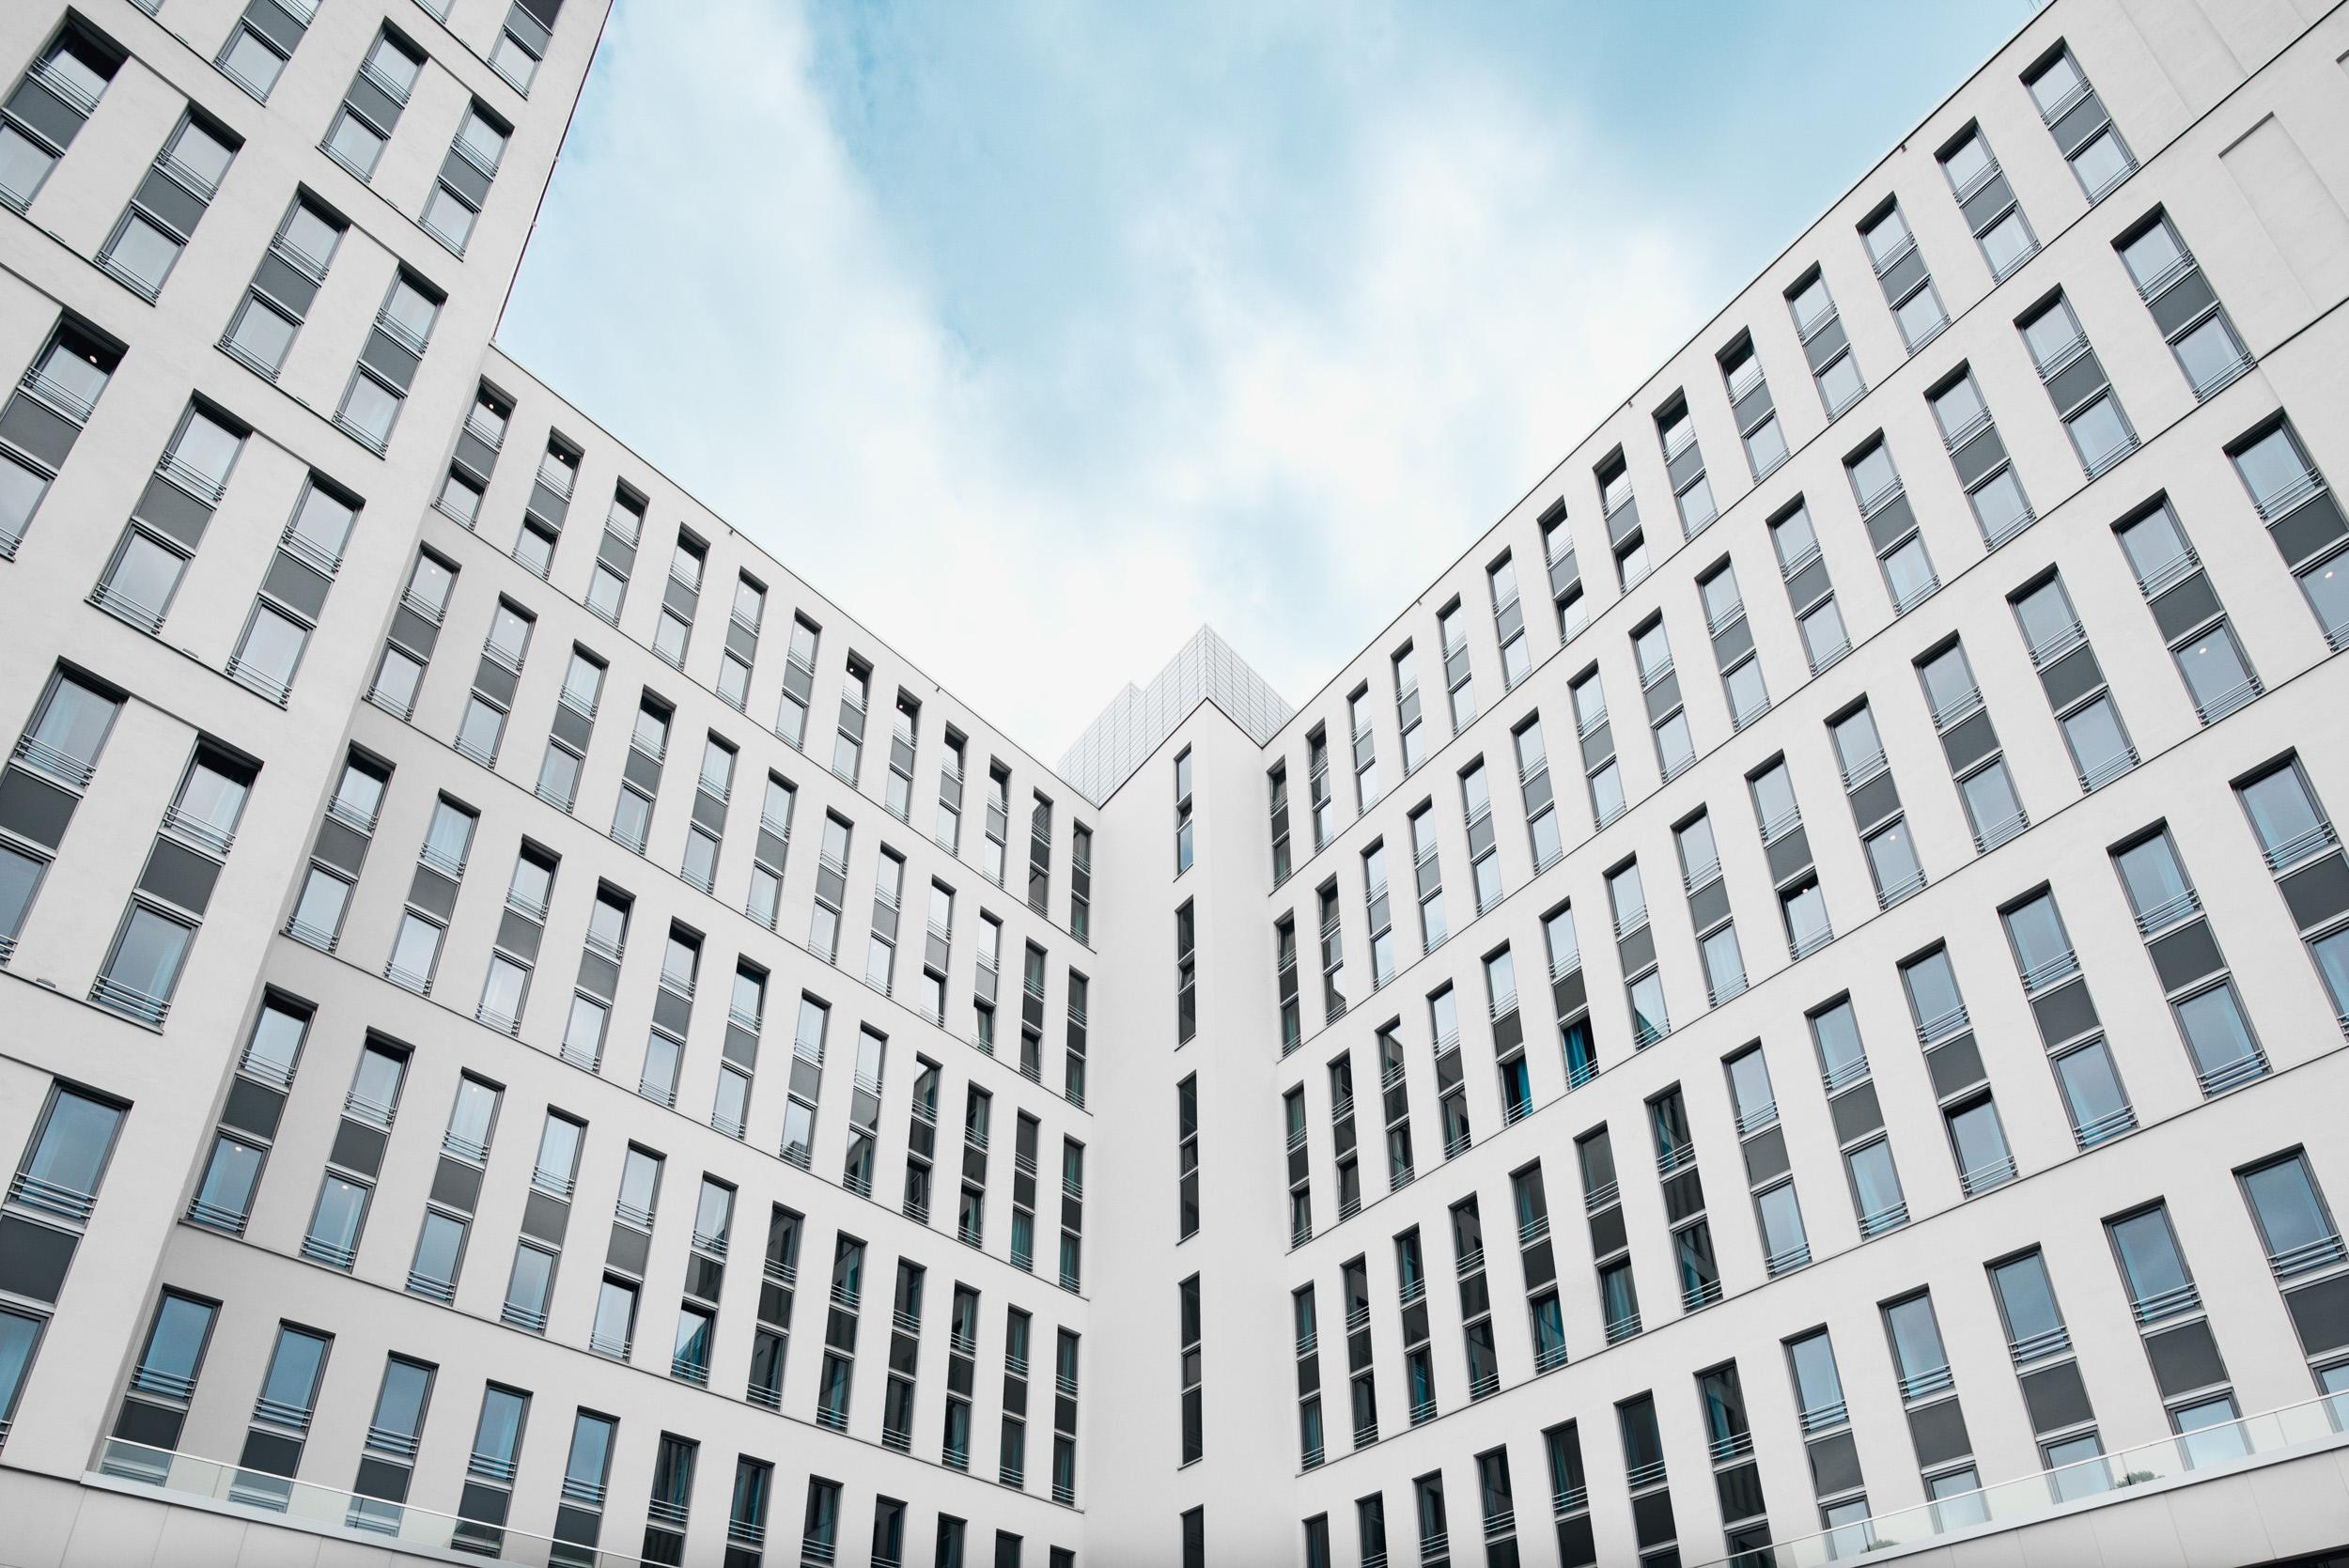 Gustav-Epple-Bauunternehmung-Motel-One-Berlin-HBF-MLX5791